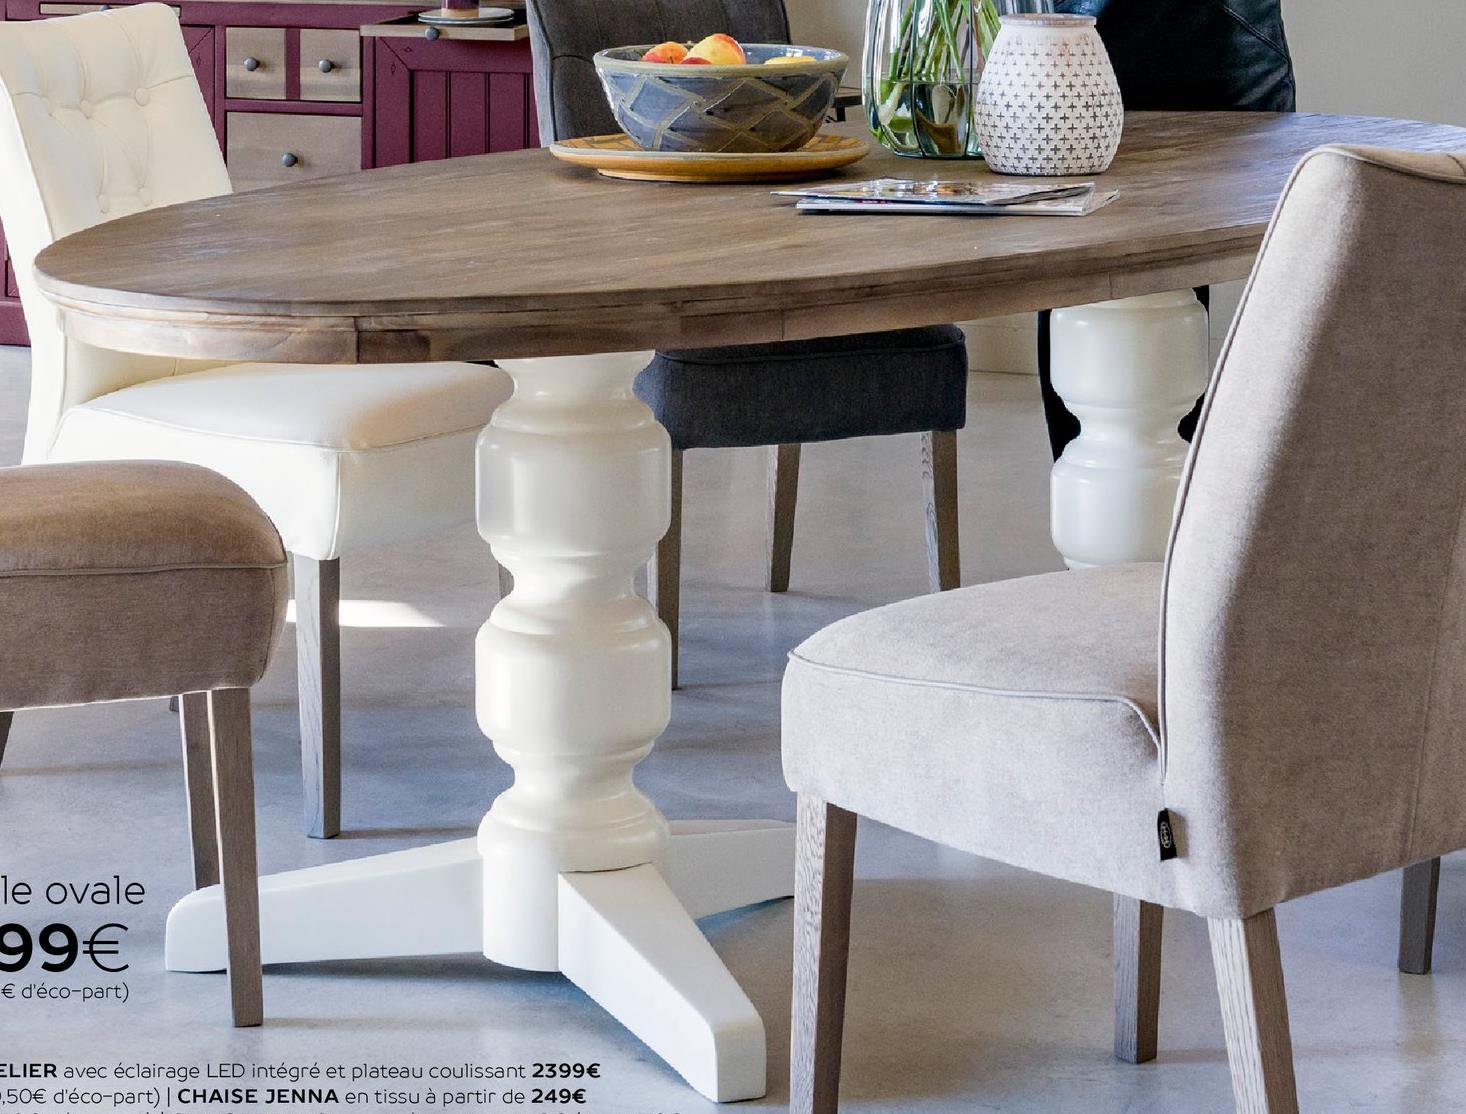 Magasin De Tissus Salon De Provence table ovale